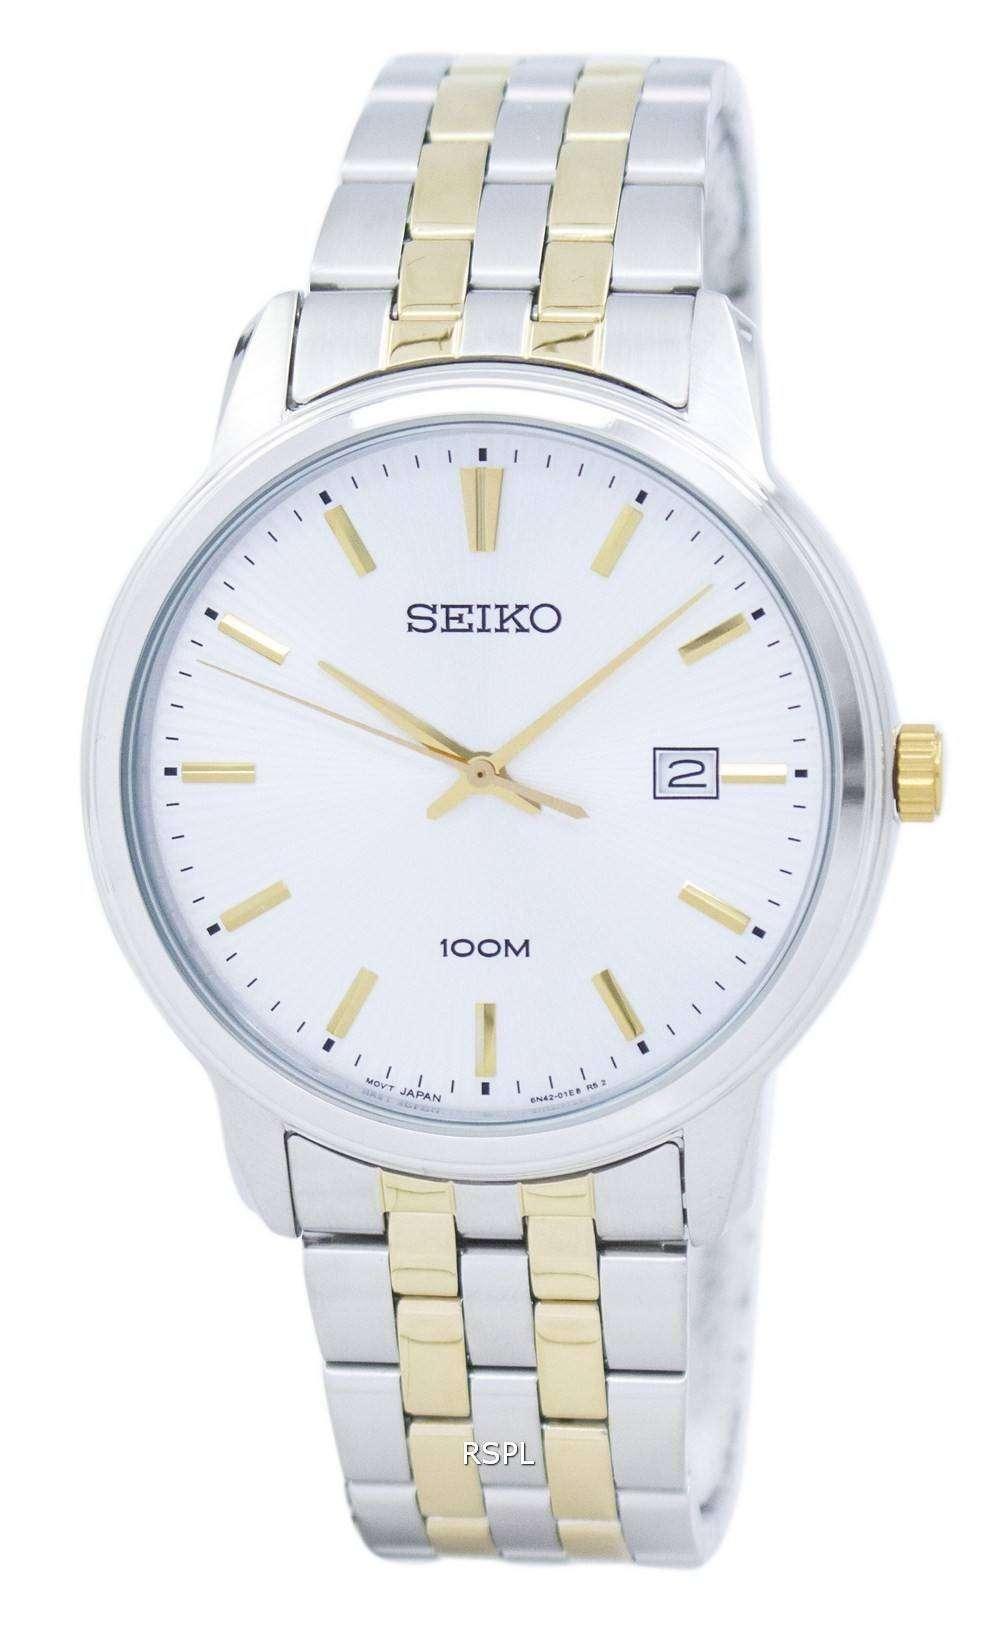 f21e7563eded Reloj Seiko Neo Classic cuarzo SUR263 SUR263P1 SUR263P de los hombres